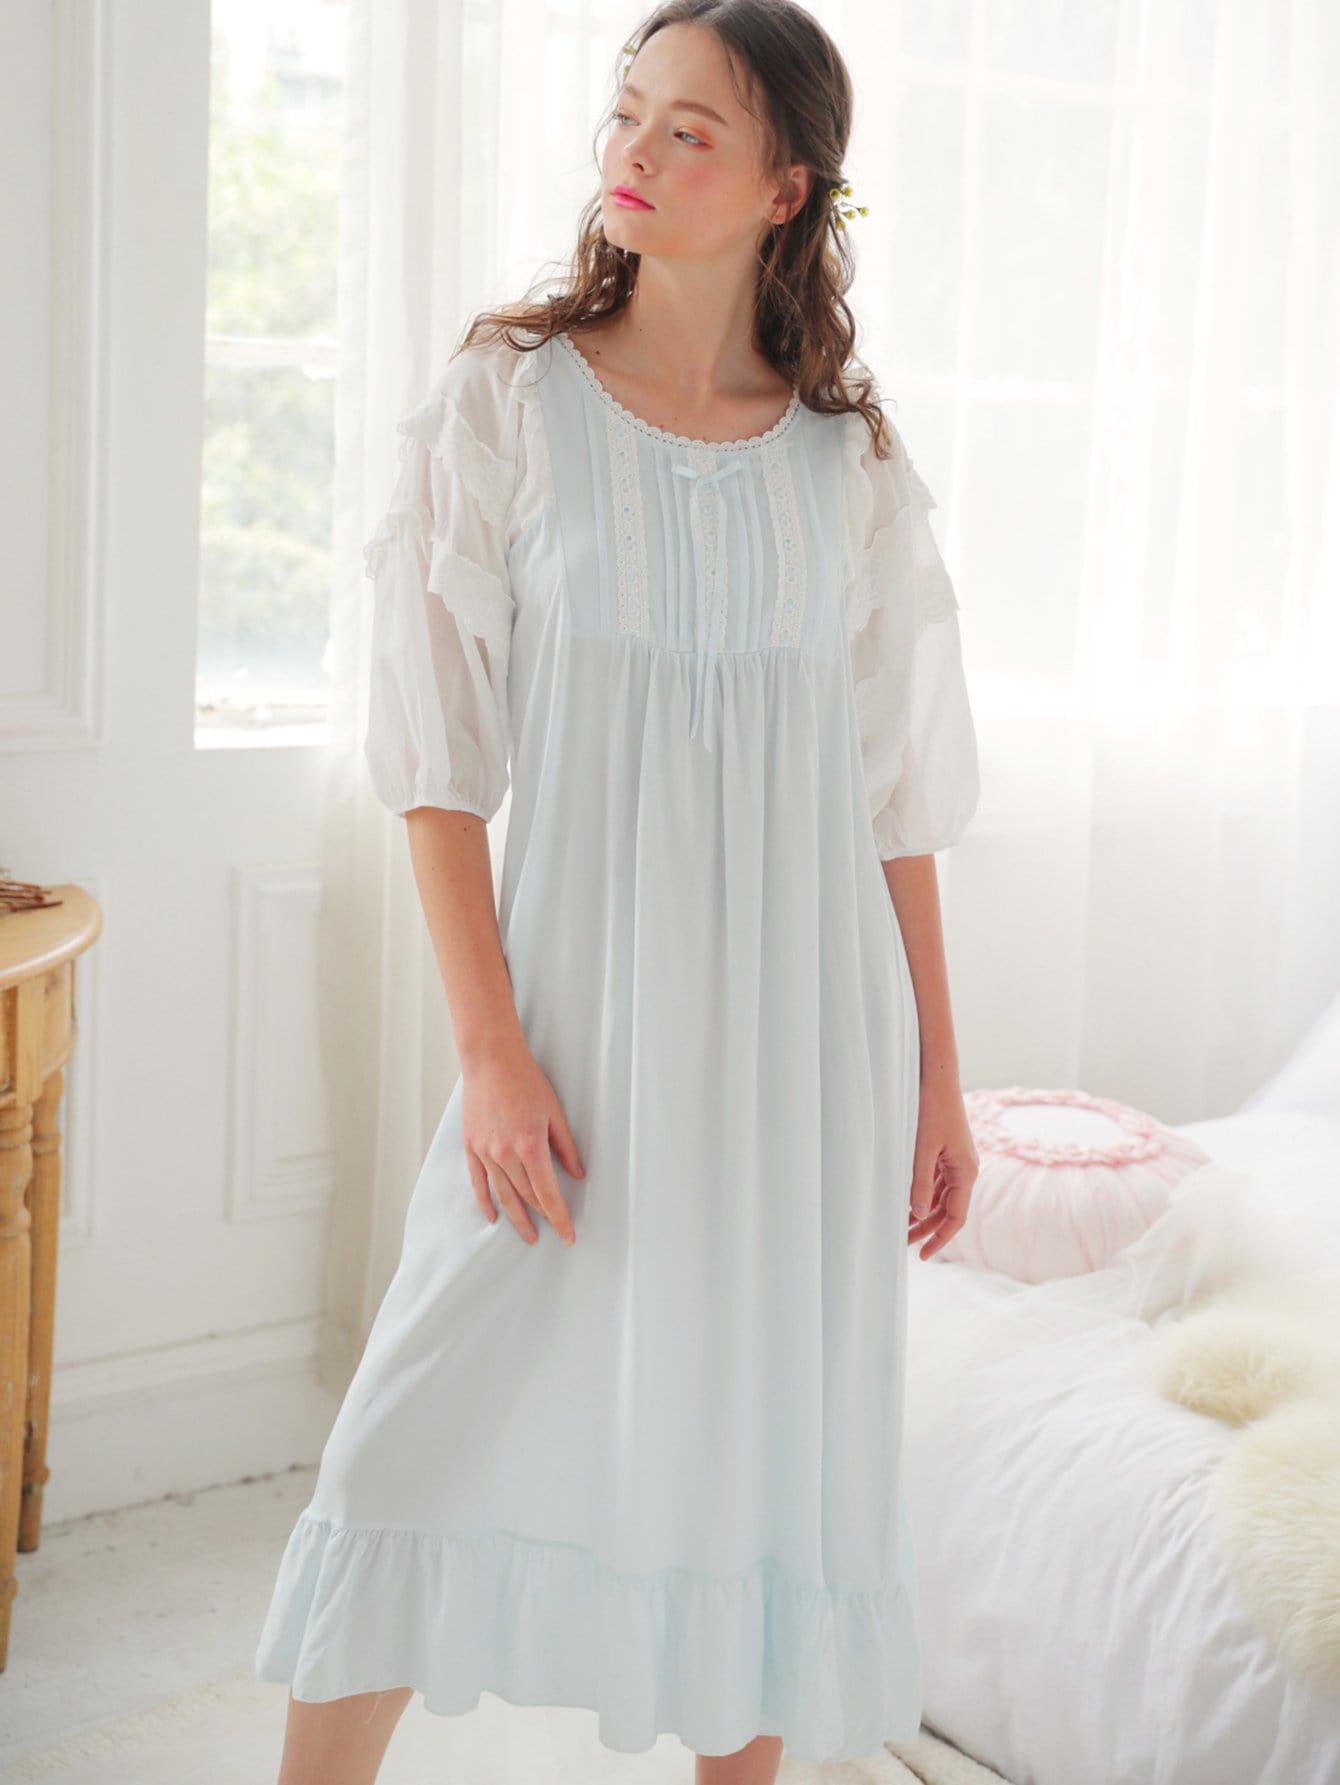 Contrast Lace Ruffle Hem Night Dress contrast mesh ruffle hem night dress